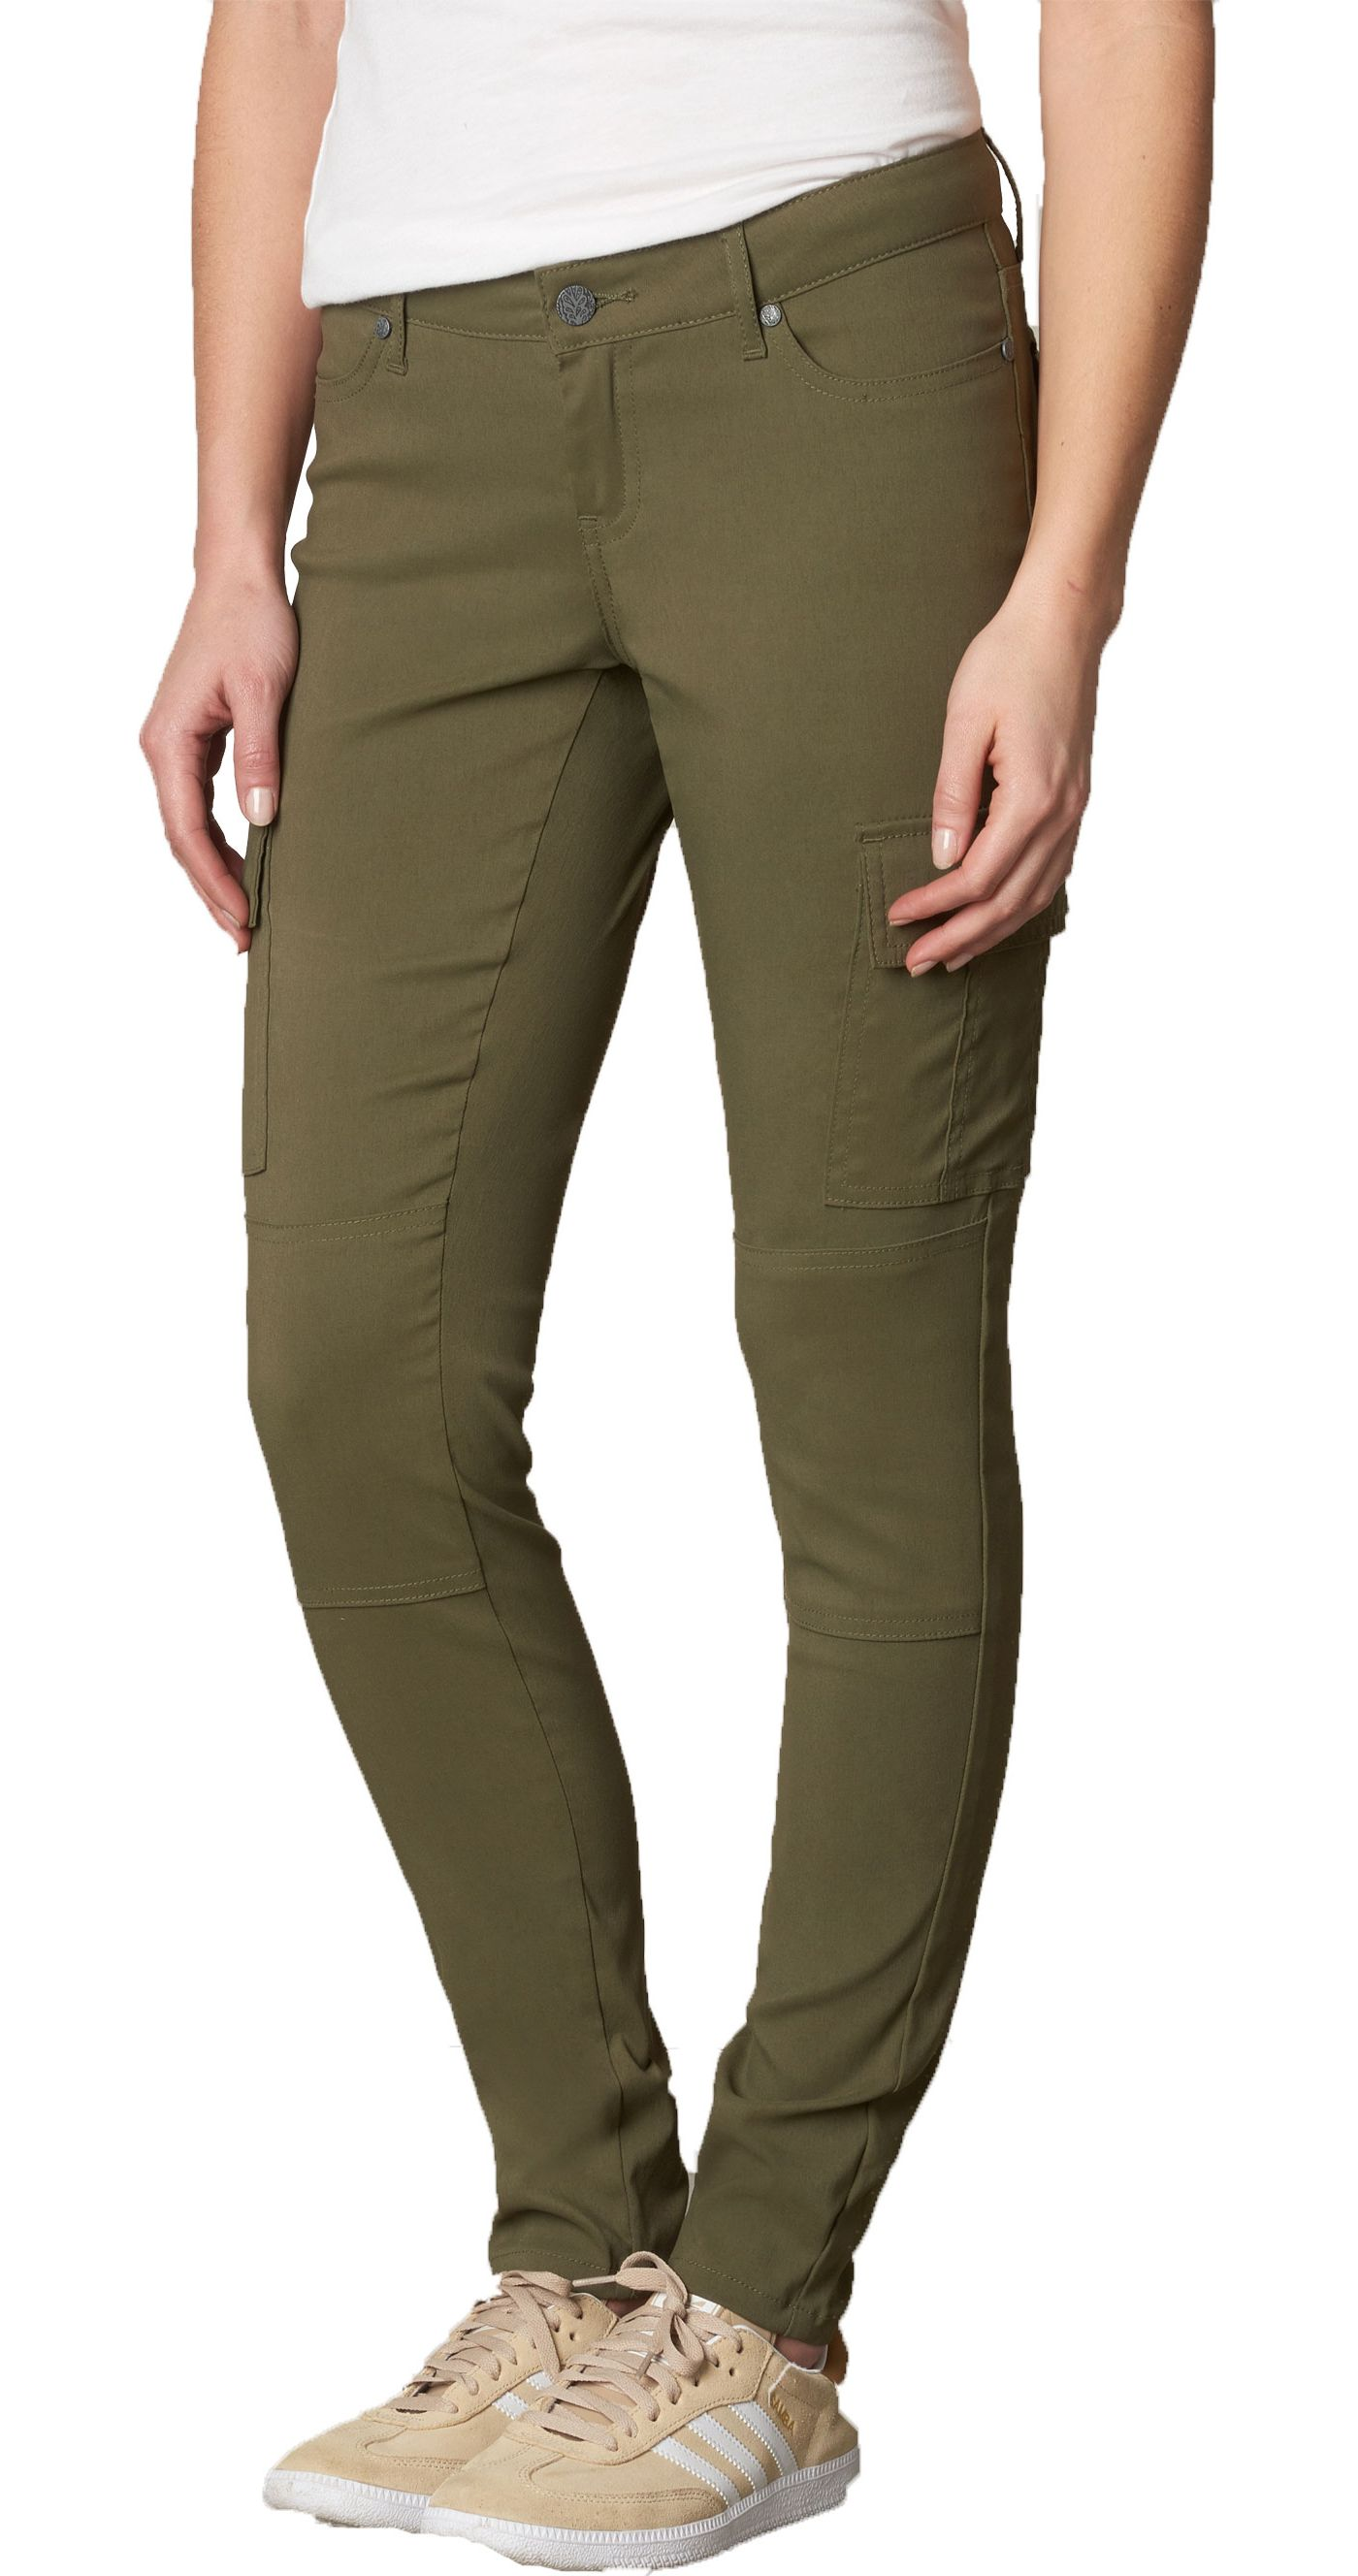 prAna Women's Meme Pants